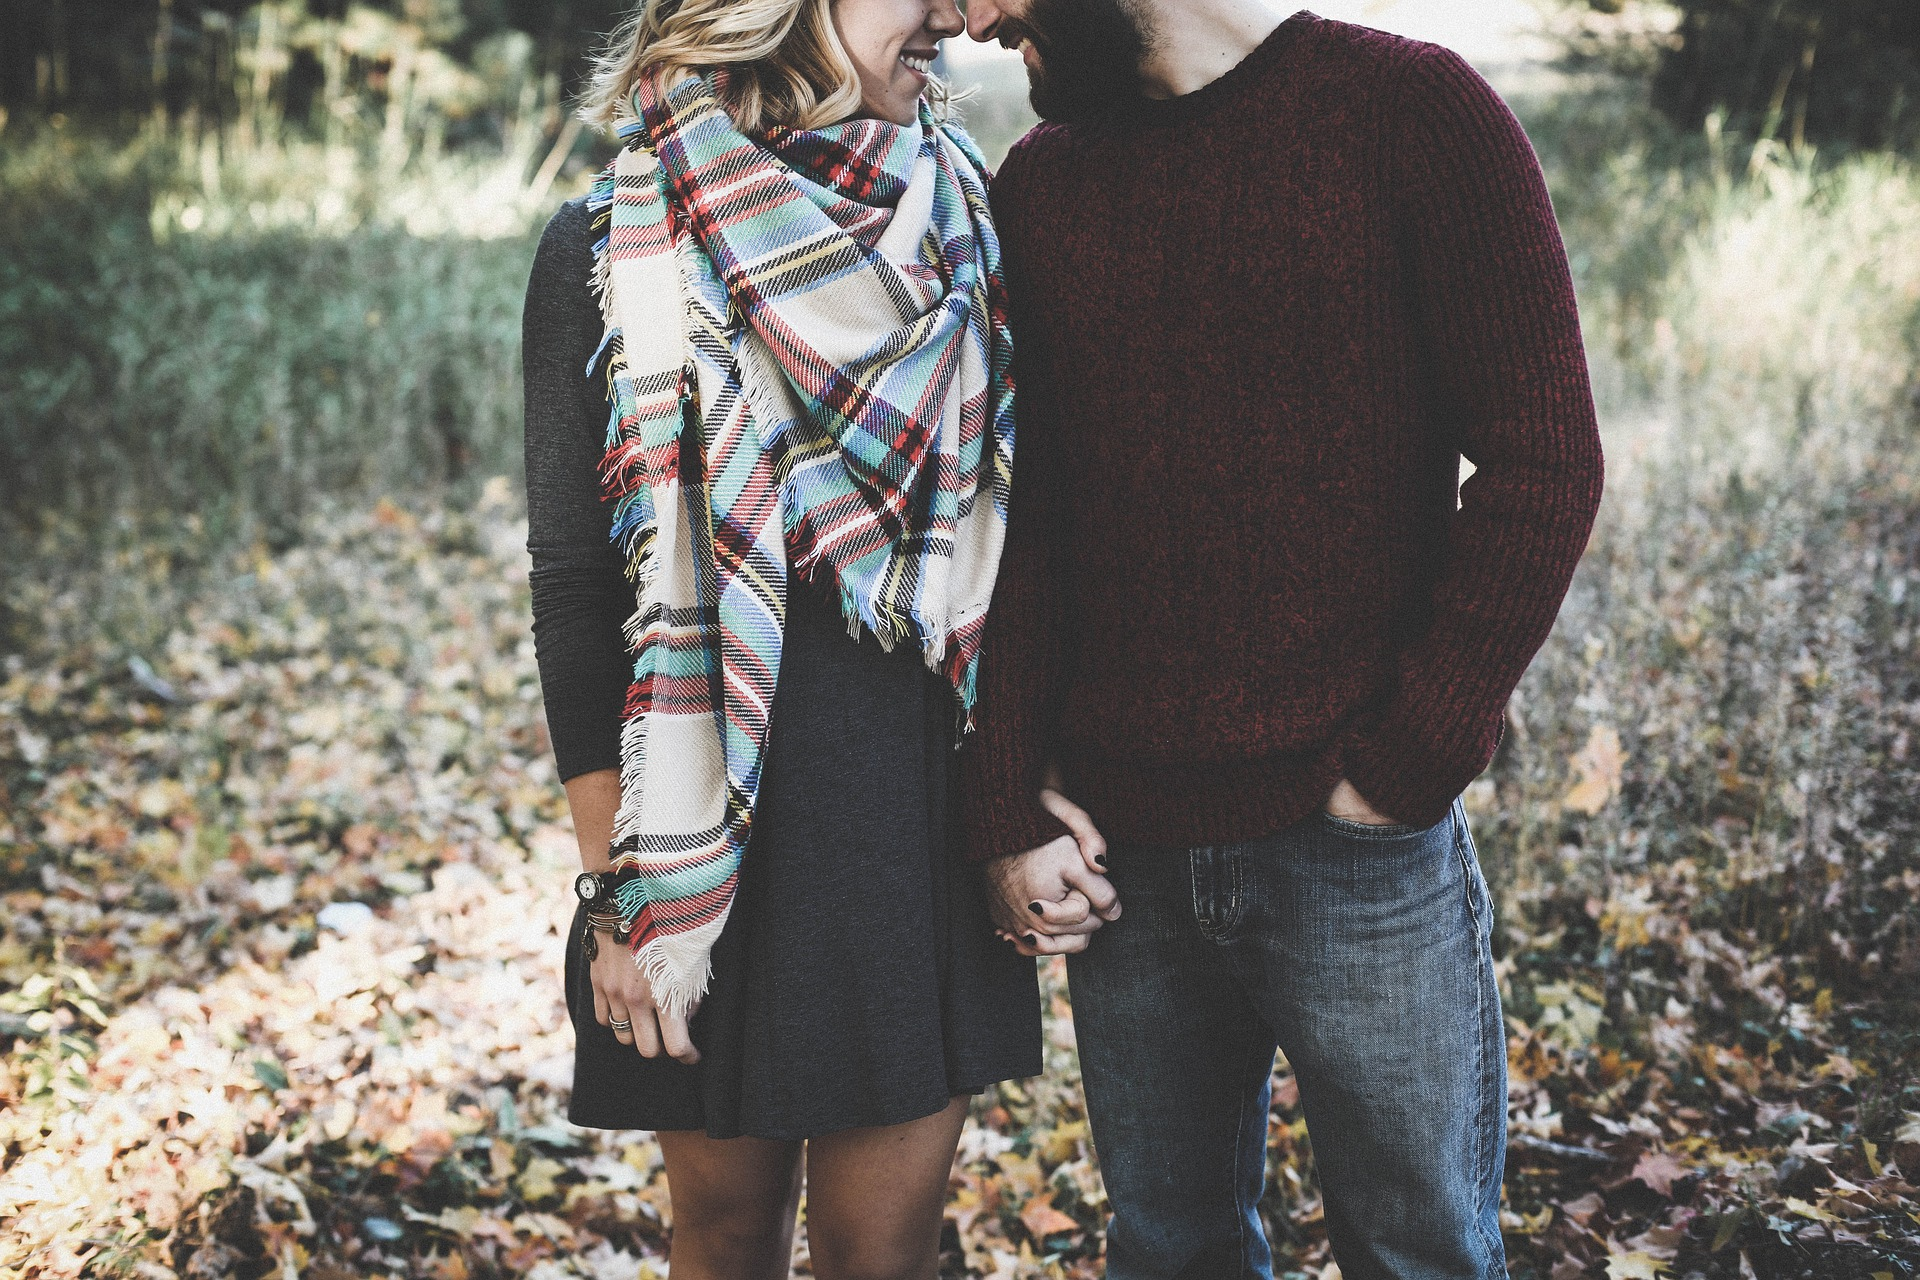 Couples Inpatient Drug Rehab Spokane Washington Addiction Treatment Couple Rehabs